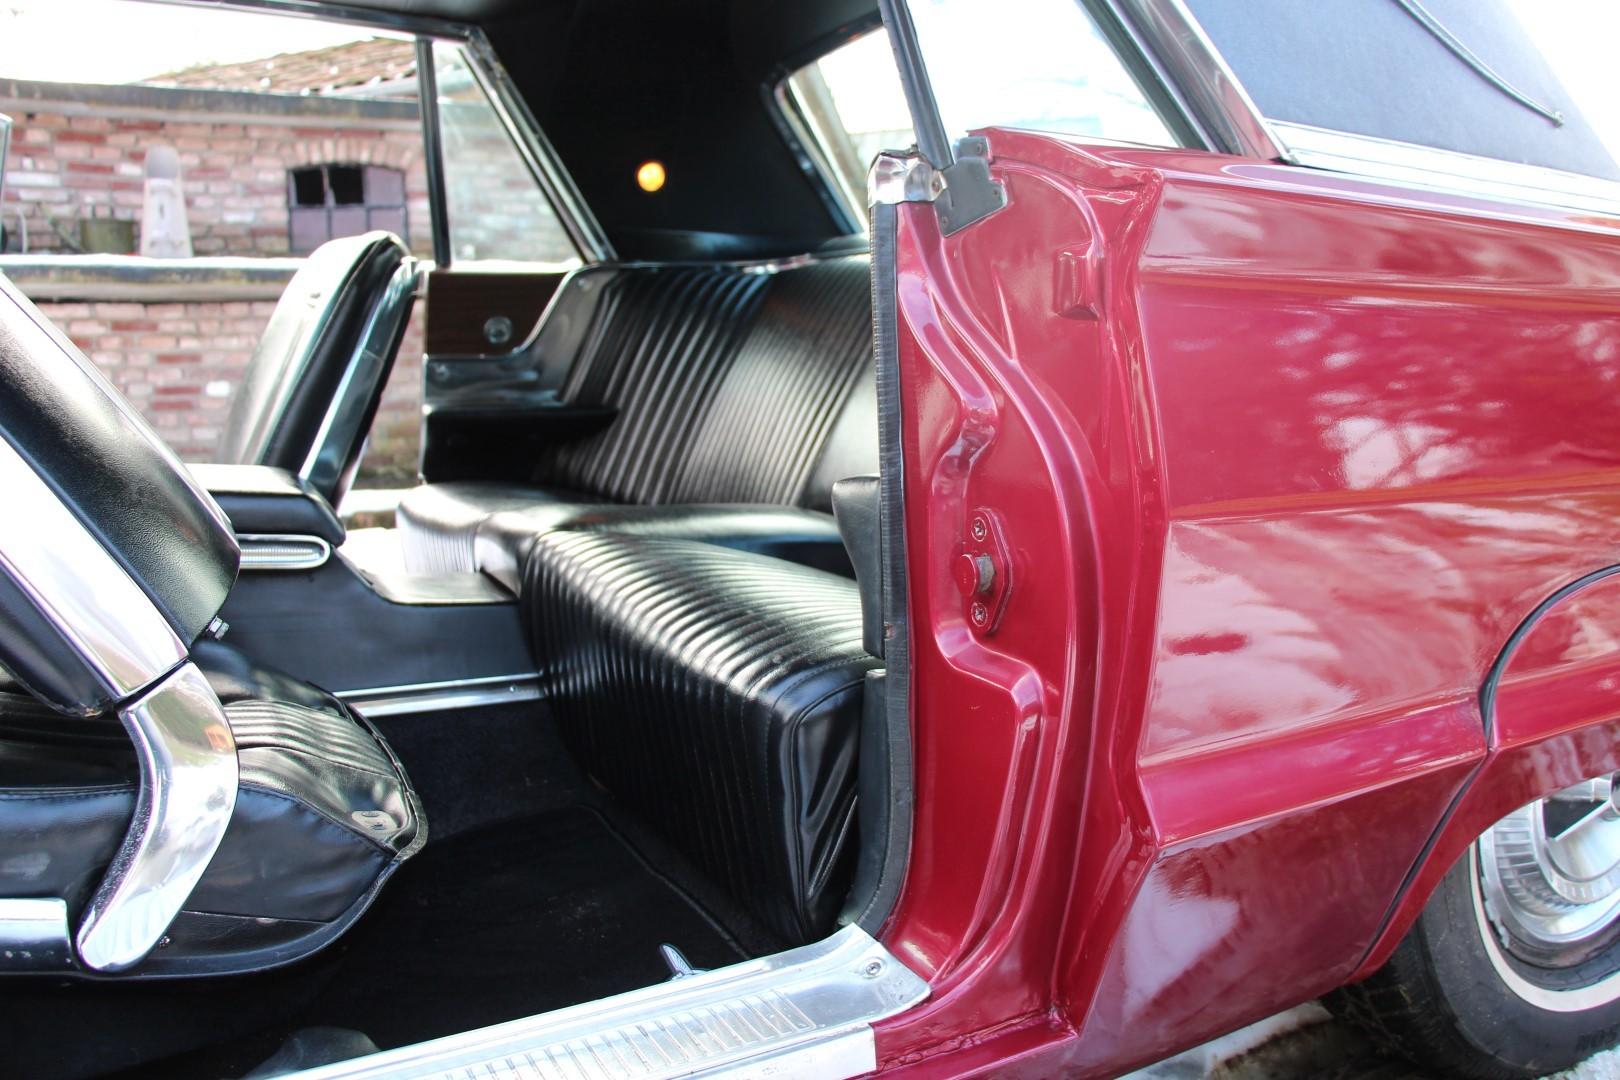 1965 Ford Thunderbird Hardtop - Burgundy new (4)